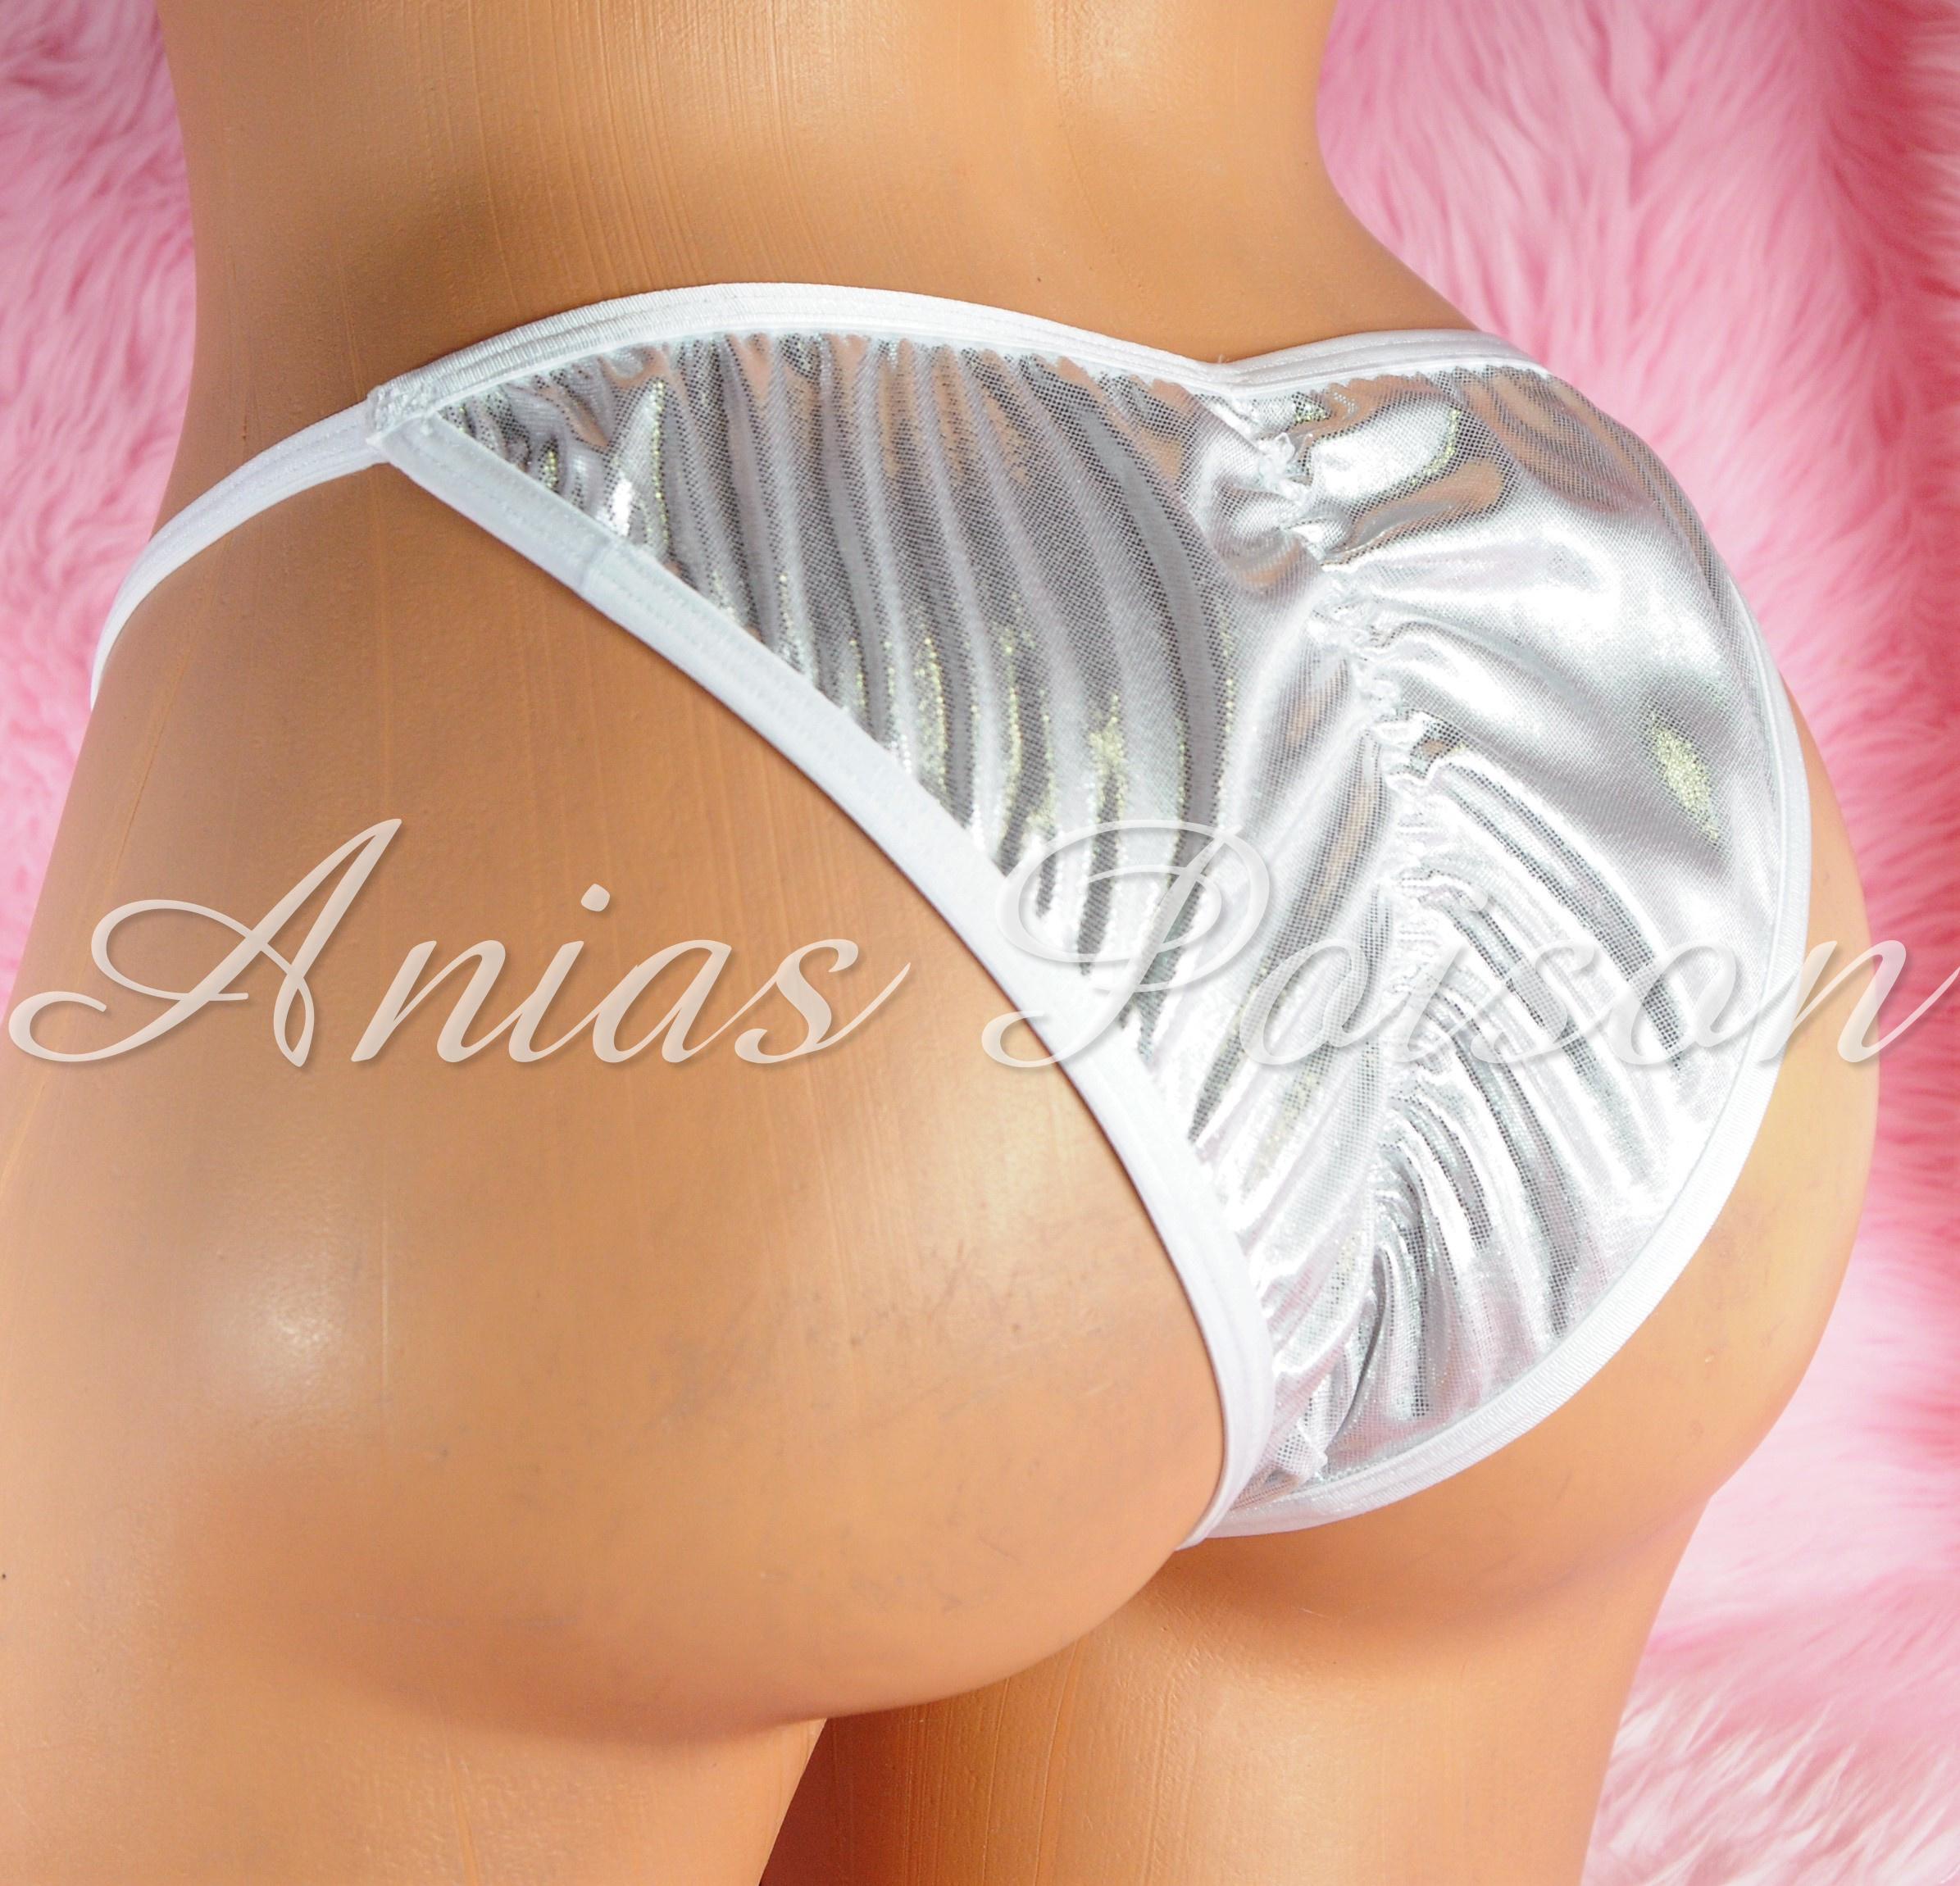 Scrunch Butt Brazilian Cut metallic shiny FOIL MANties  Cheeky cut string bikini sissy mens Sissy underwear panties 00223